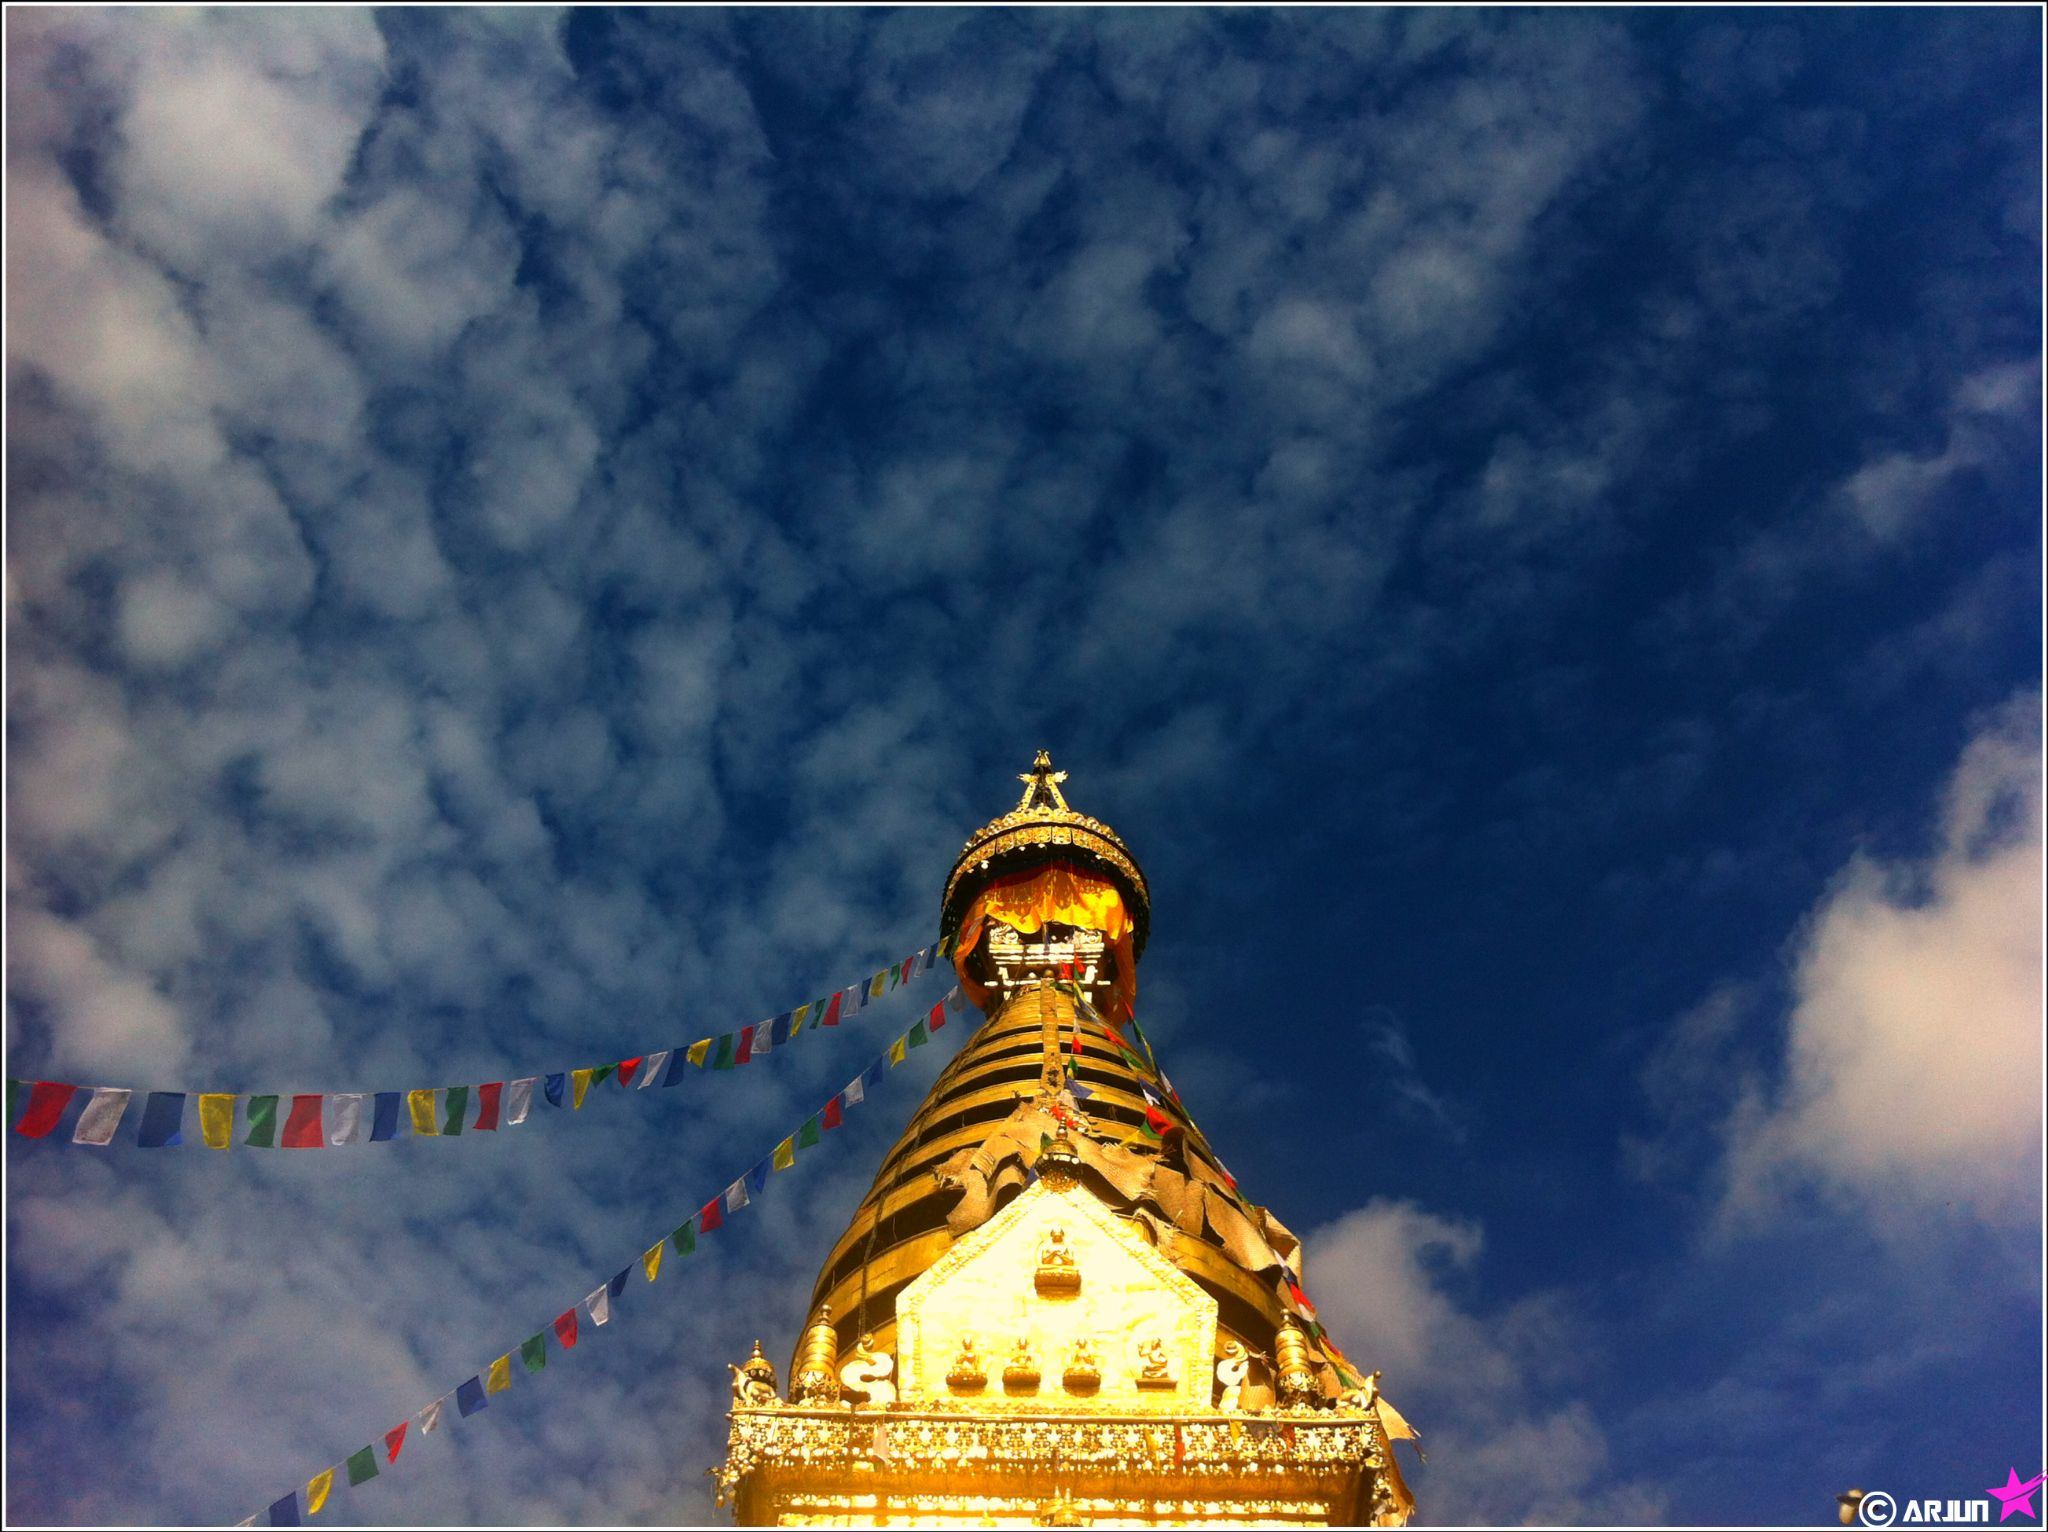 Syambhunath Temple (Monkey Temple) by Arjun Bhetwal